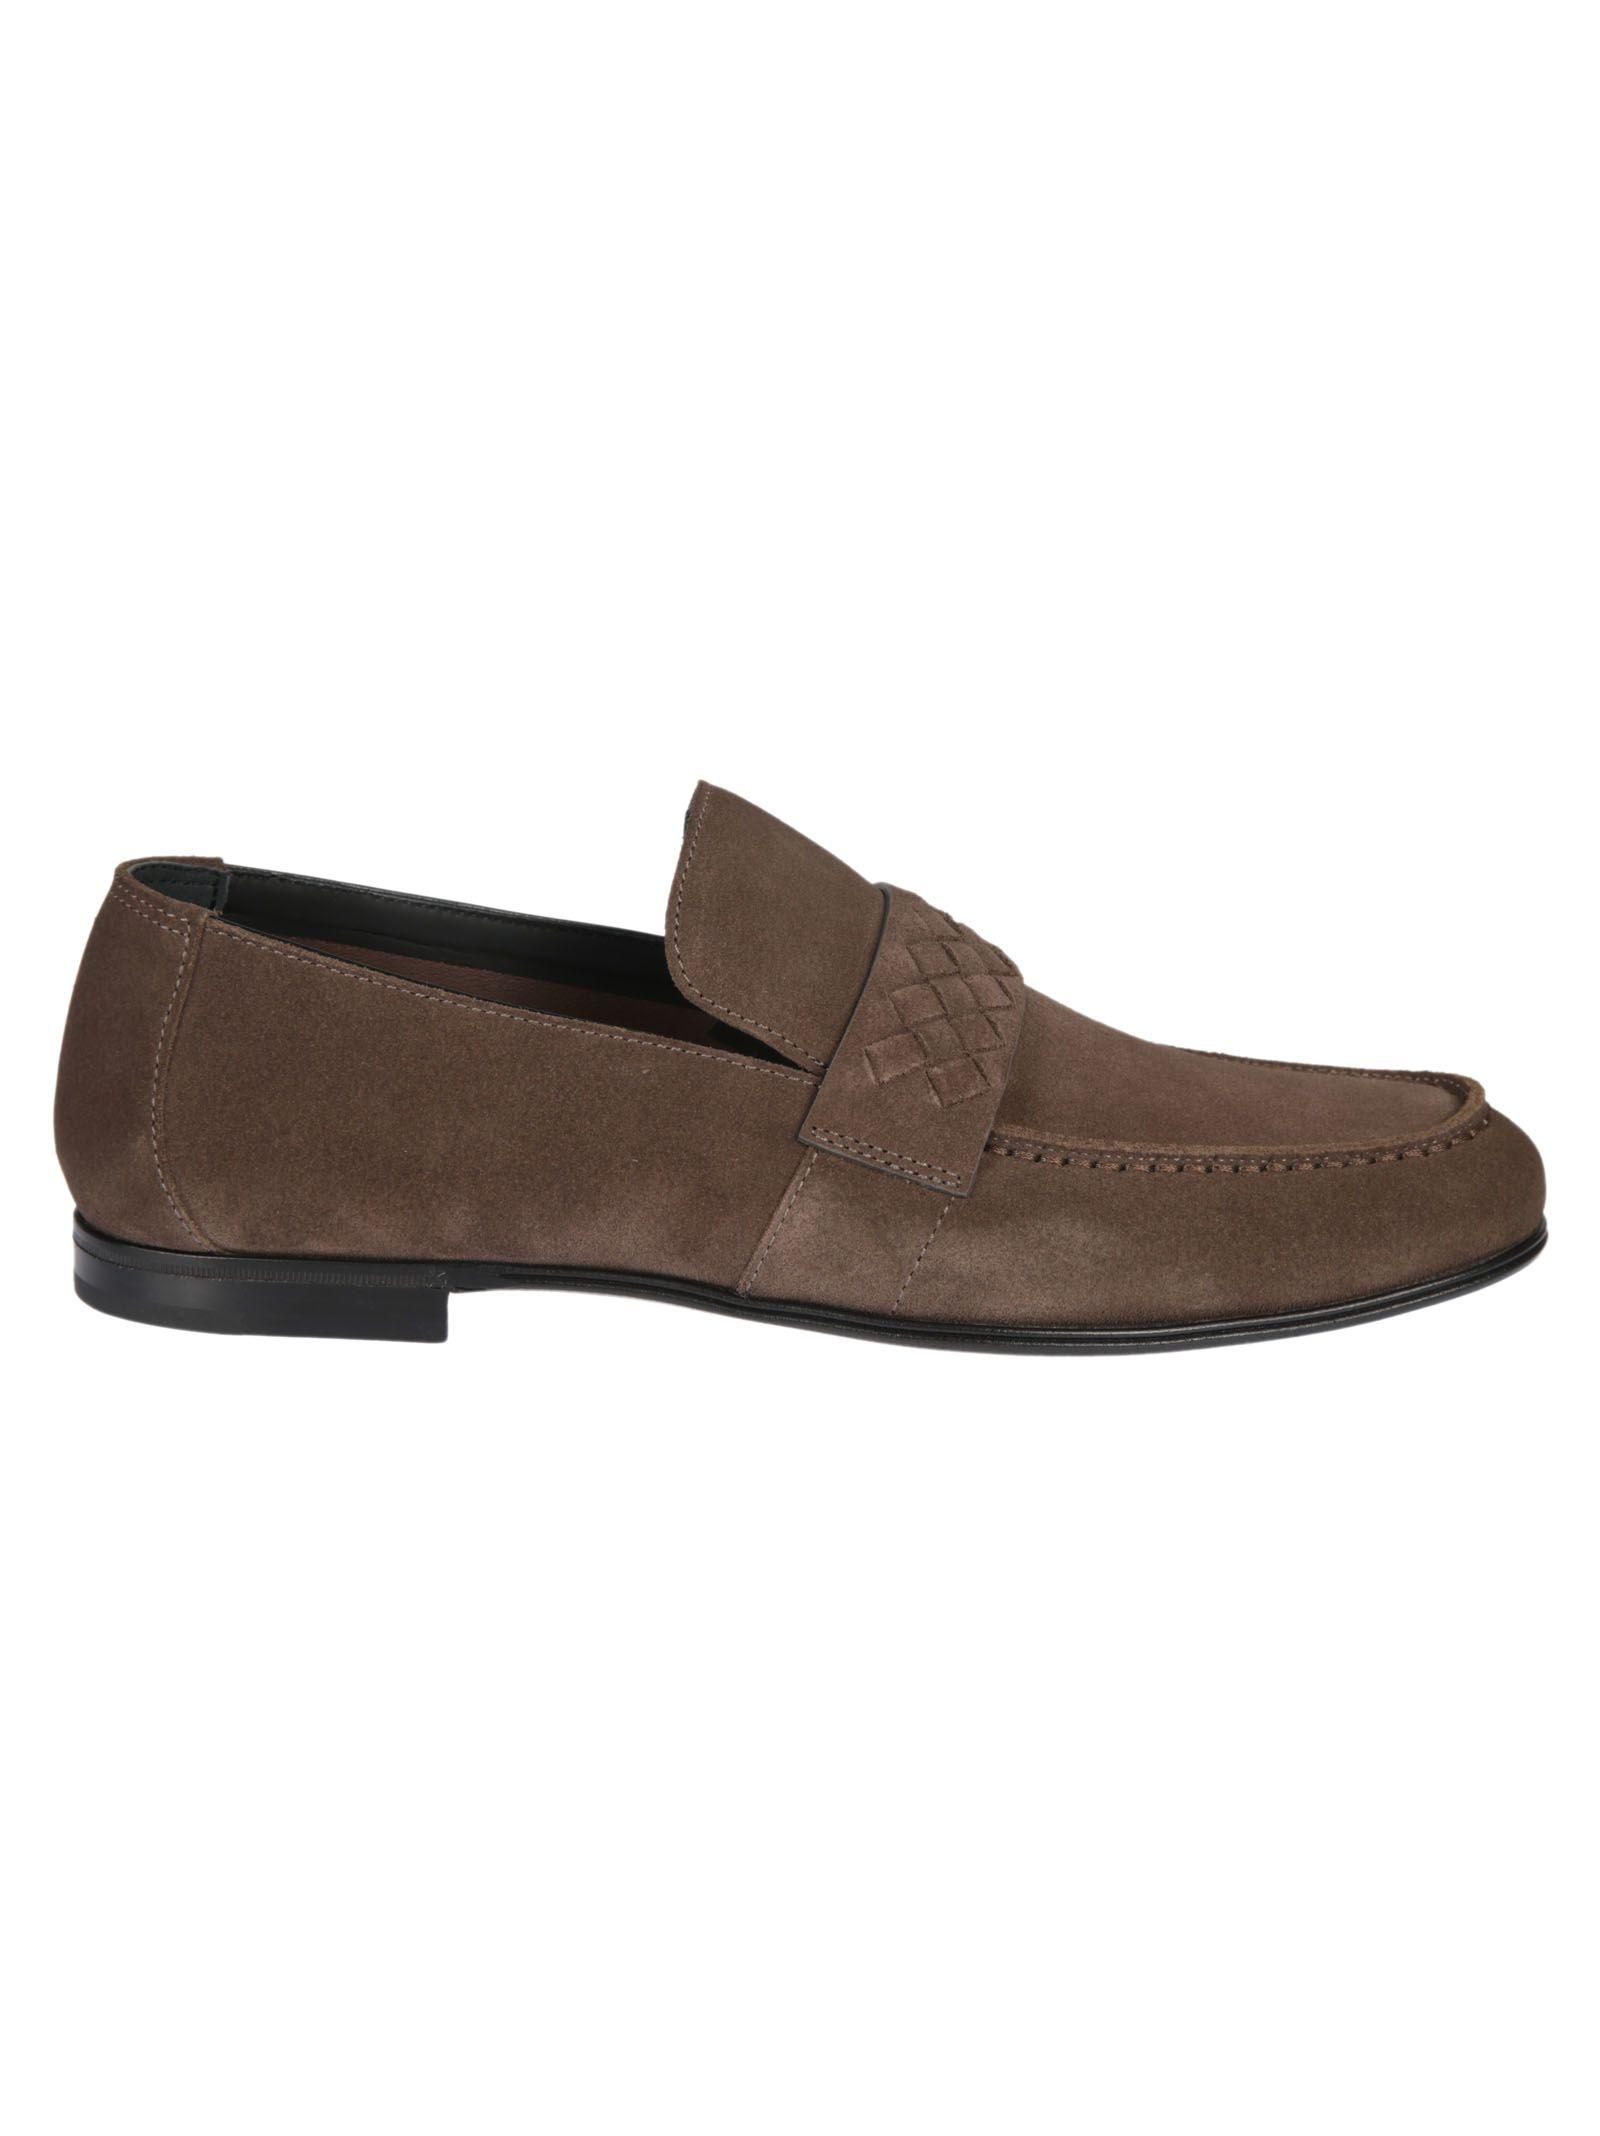 Bottega Veneta Classic Loafers